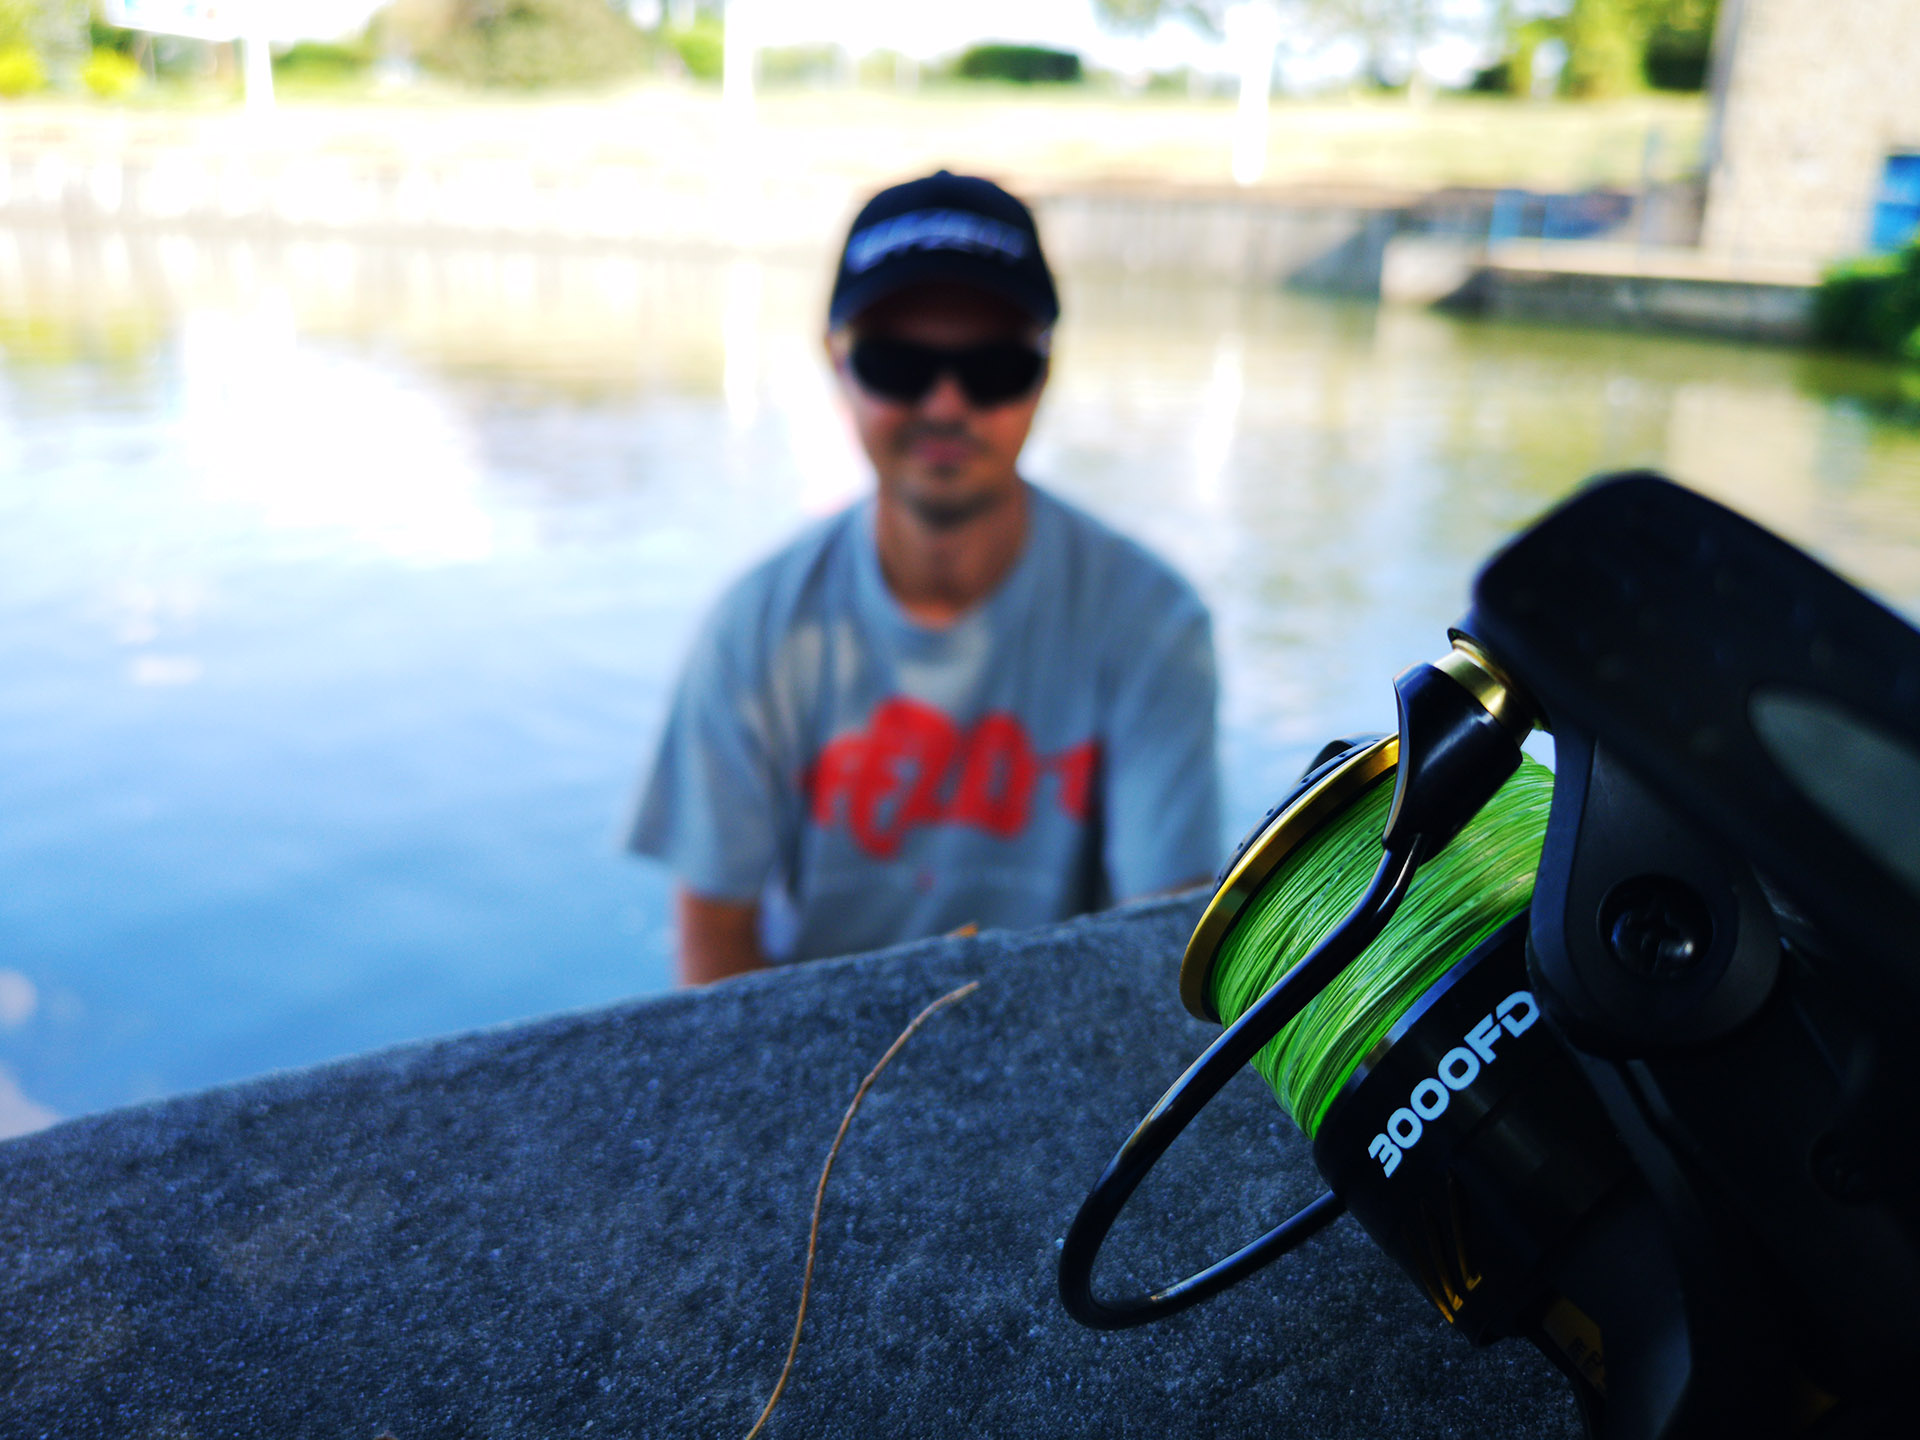 mulineta echipament de pescuit la salau